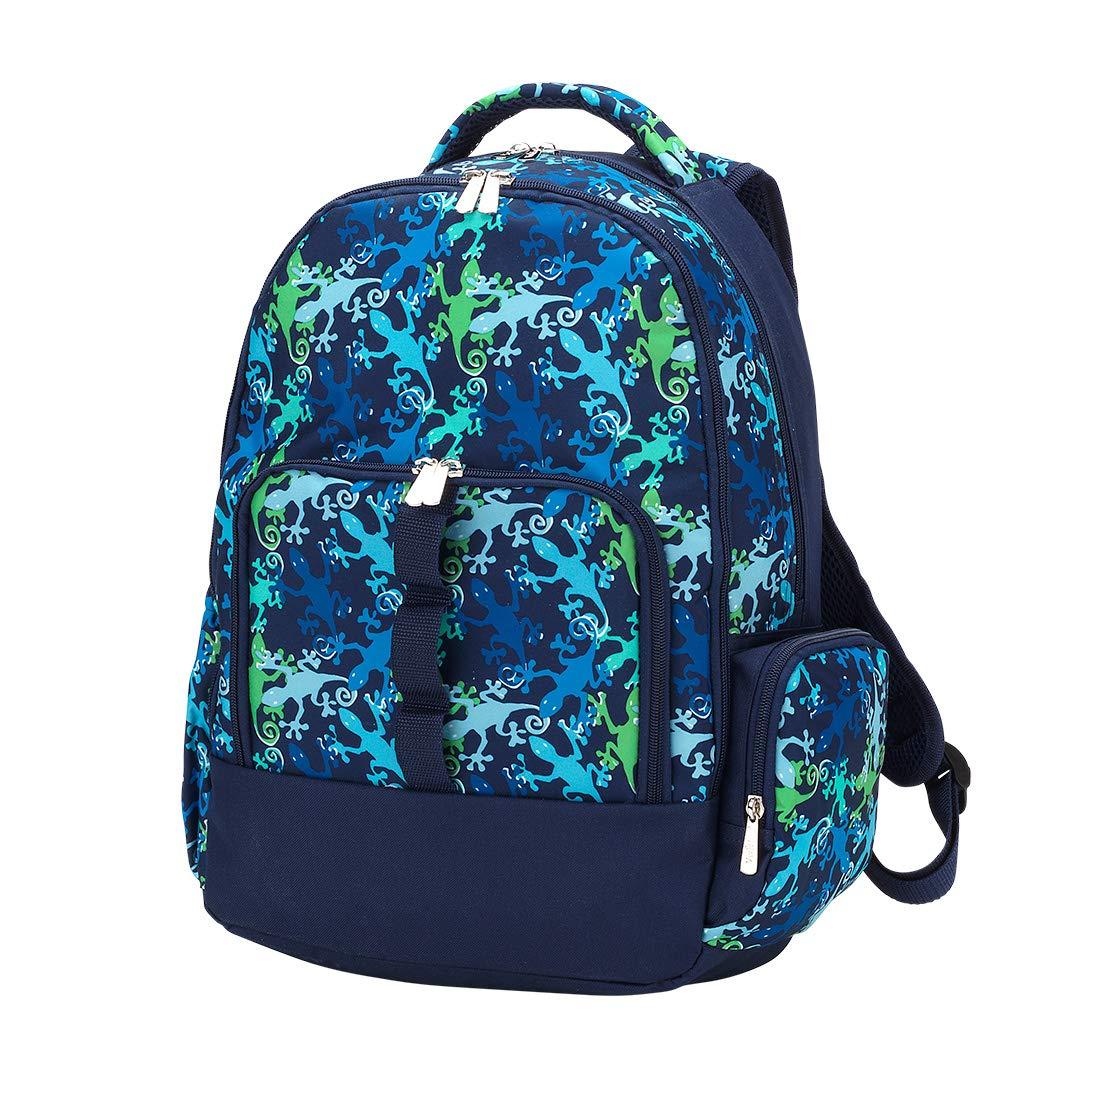 Wholesale Boutique Gecko Backpack by Wholesale Boutique